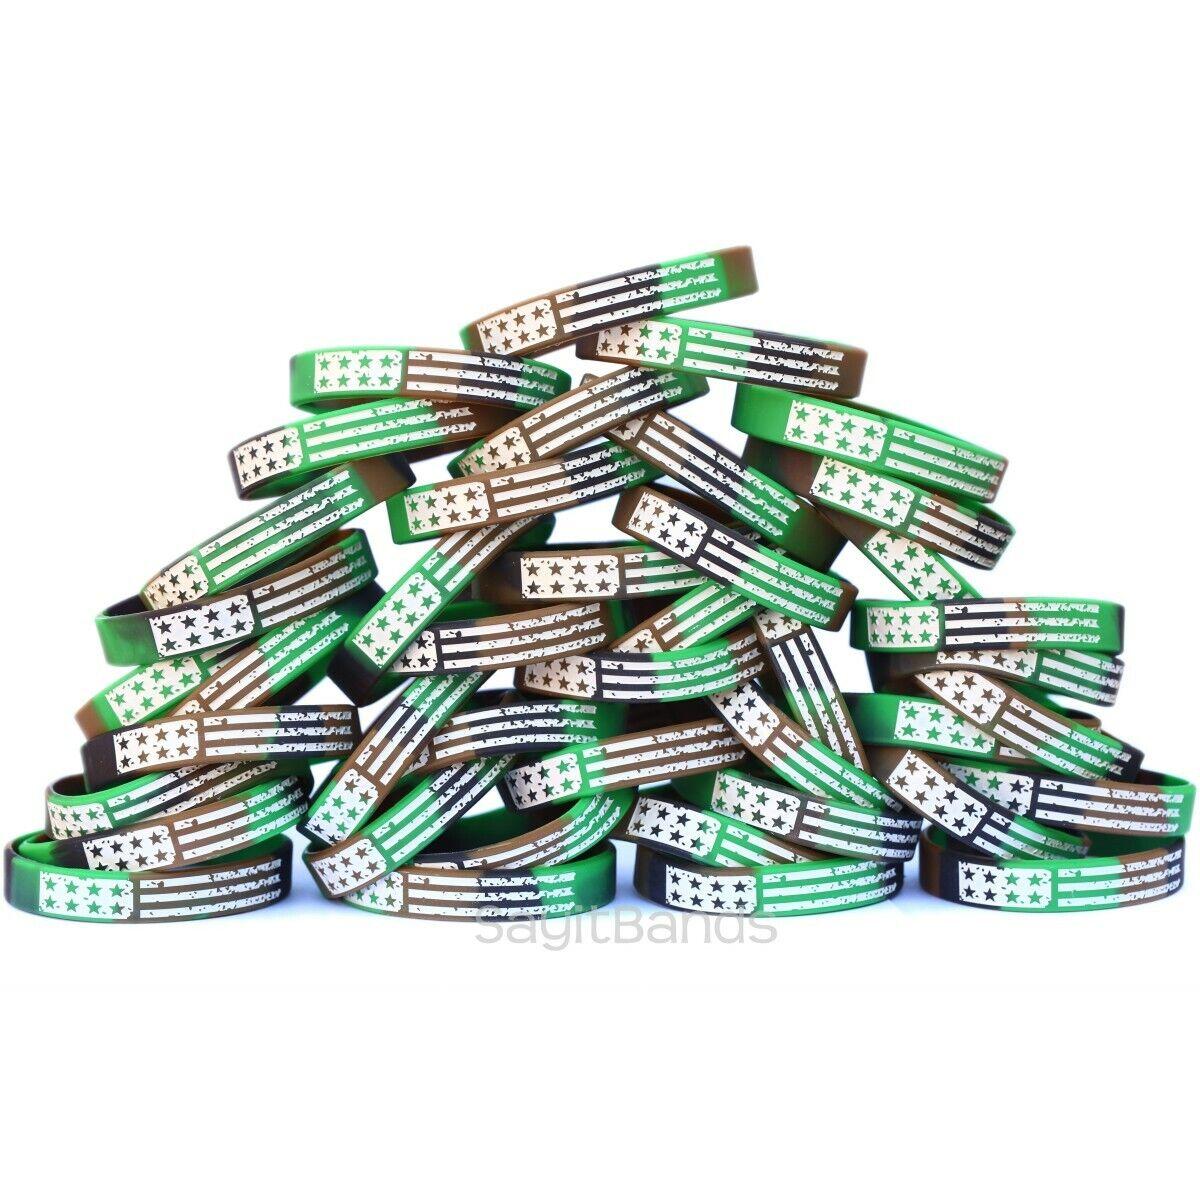 100 Camo Vintage Flag Debossed color Filled Silicone Wristband Bracelets